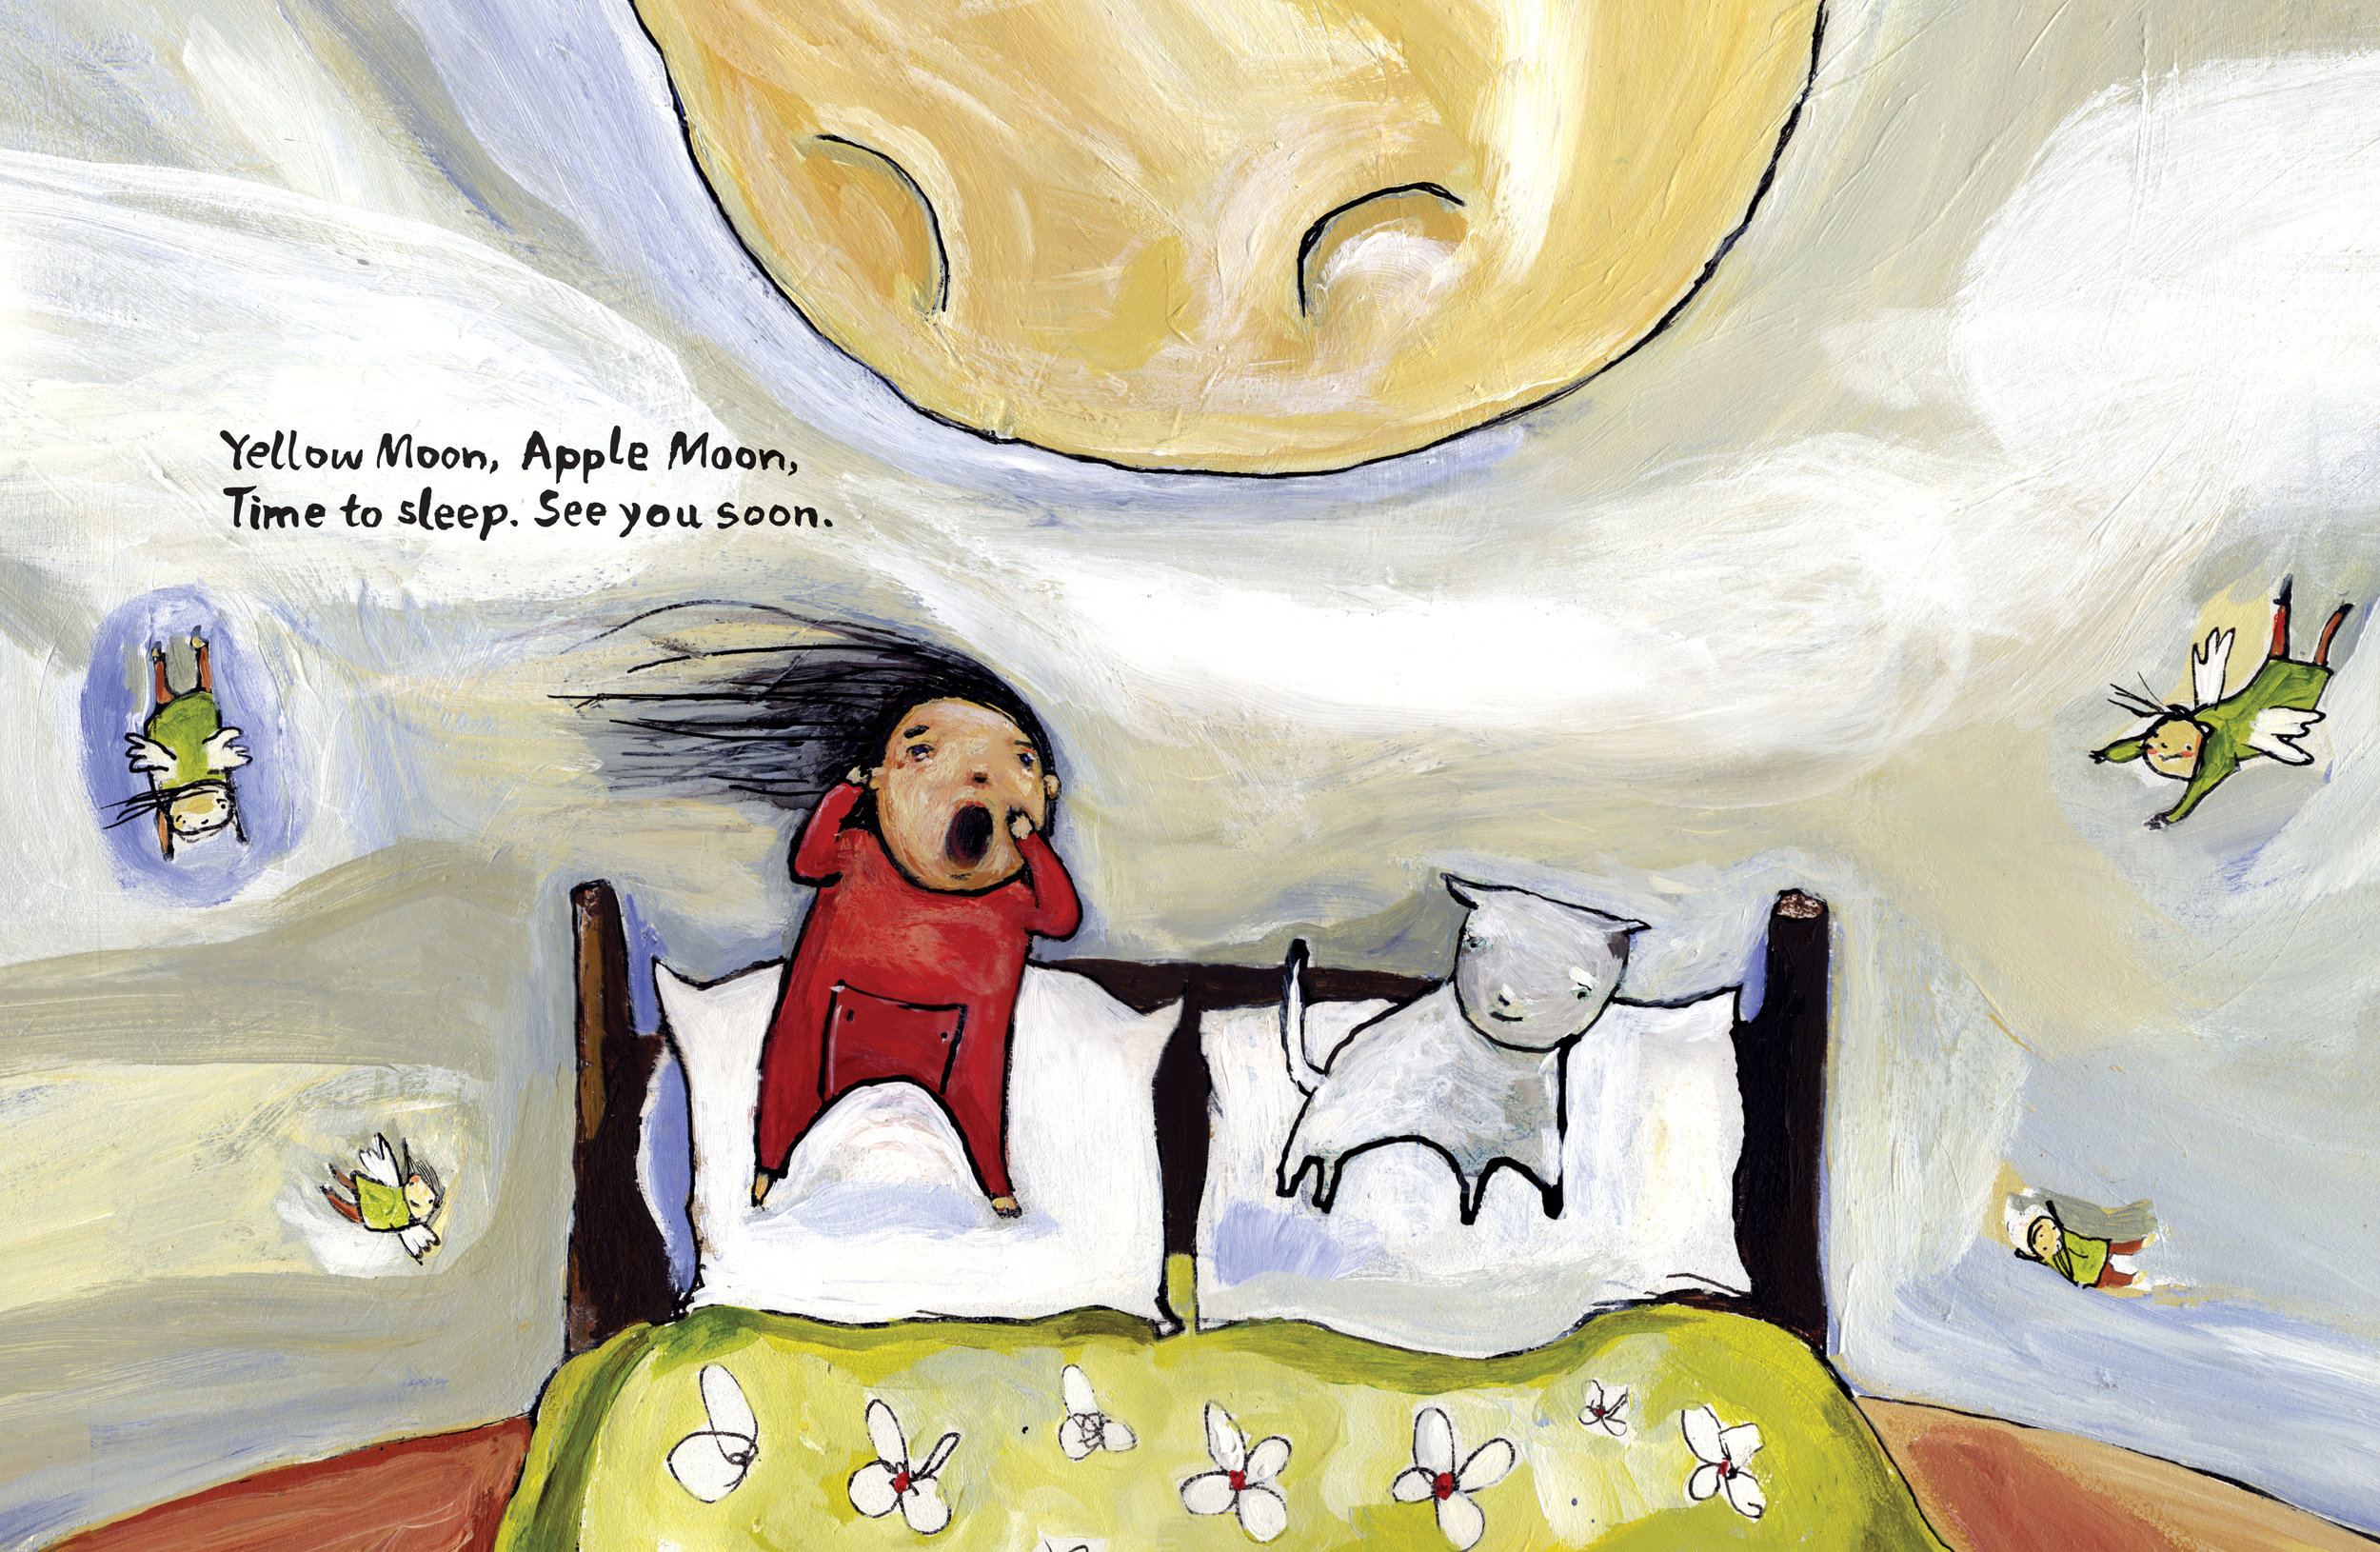 Yellow Moon, Apple Moon Written by Pamela Porter, Illustrated by Matt James